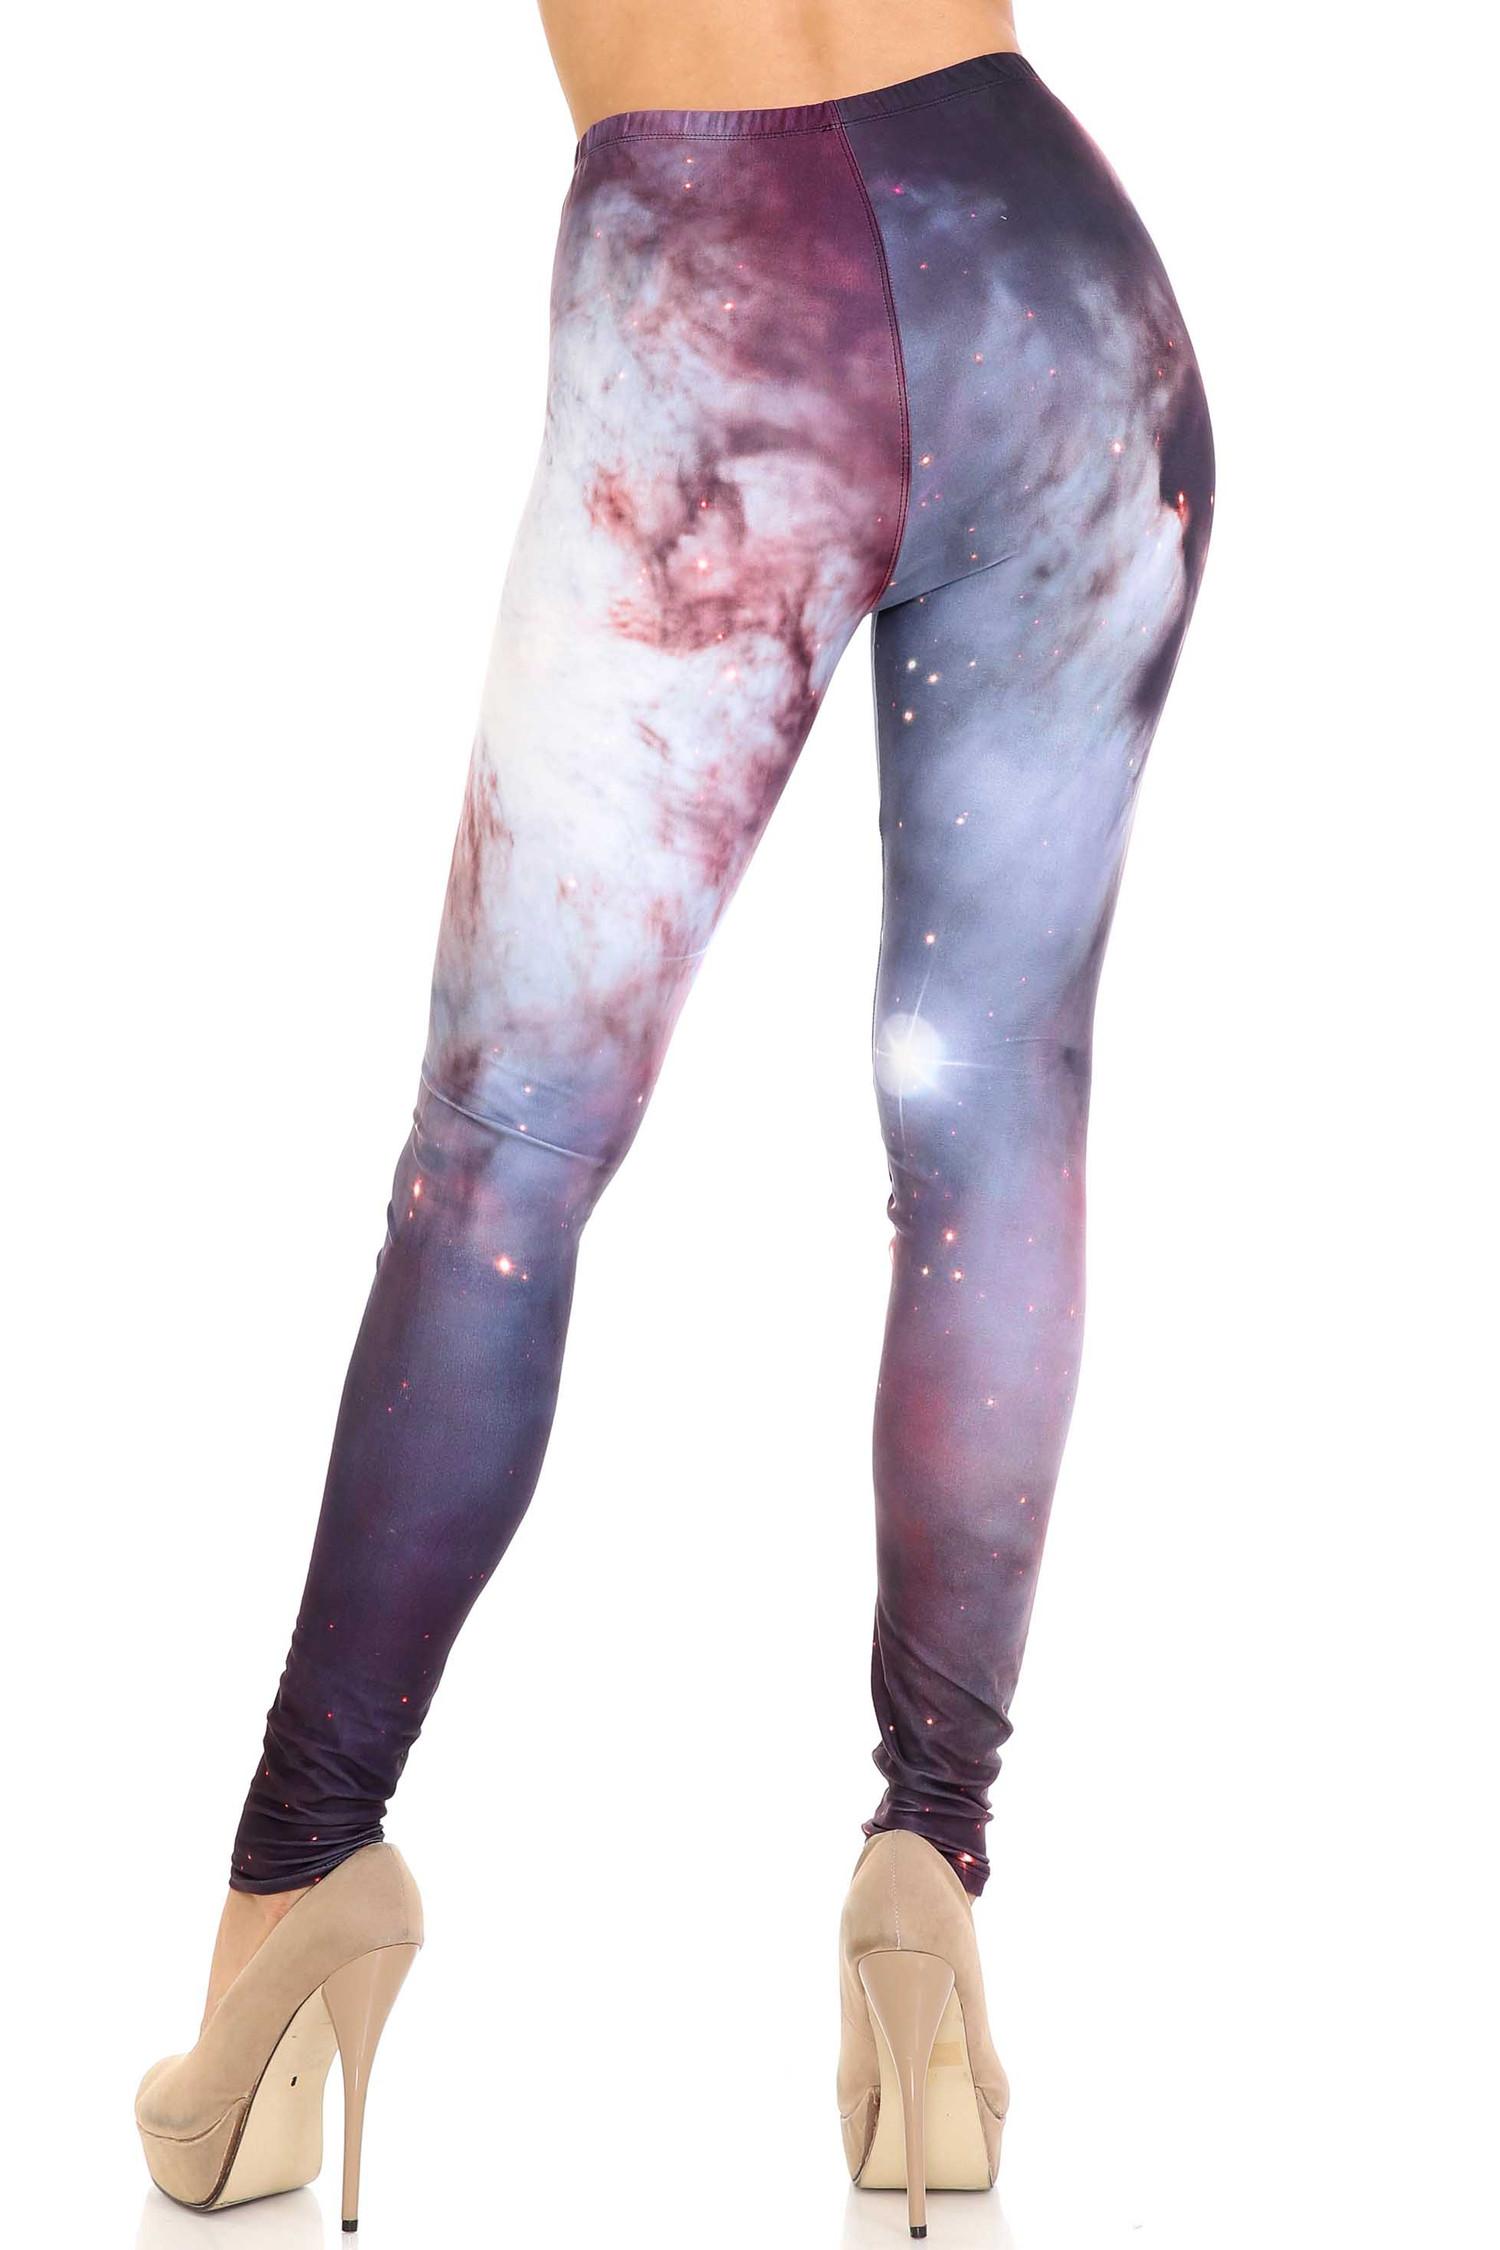 Creamy Soft Black Galaxy Extra Plus Size Leggings - 3X-5X - USA Fashion™